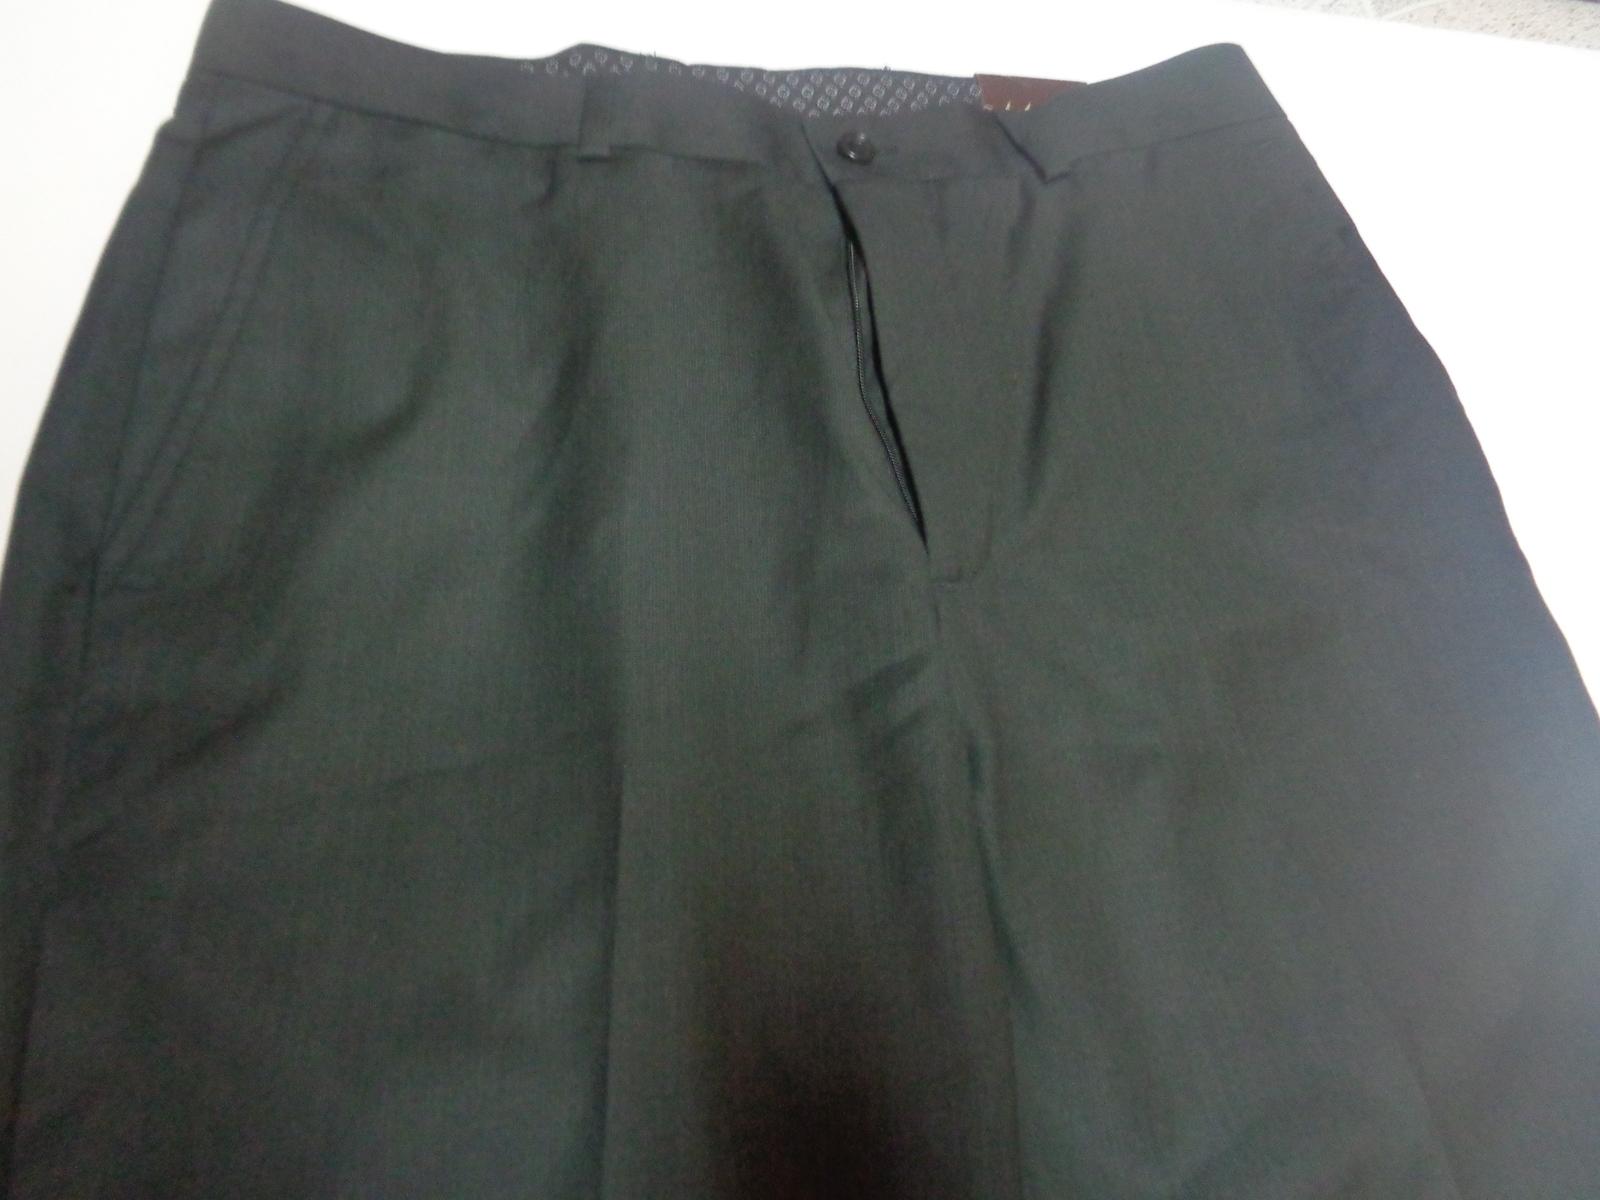 Perry Ellis Men's Dress Slacks NWT Charcoal SZ 32 x 32